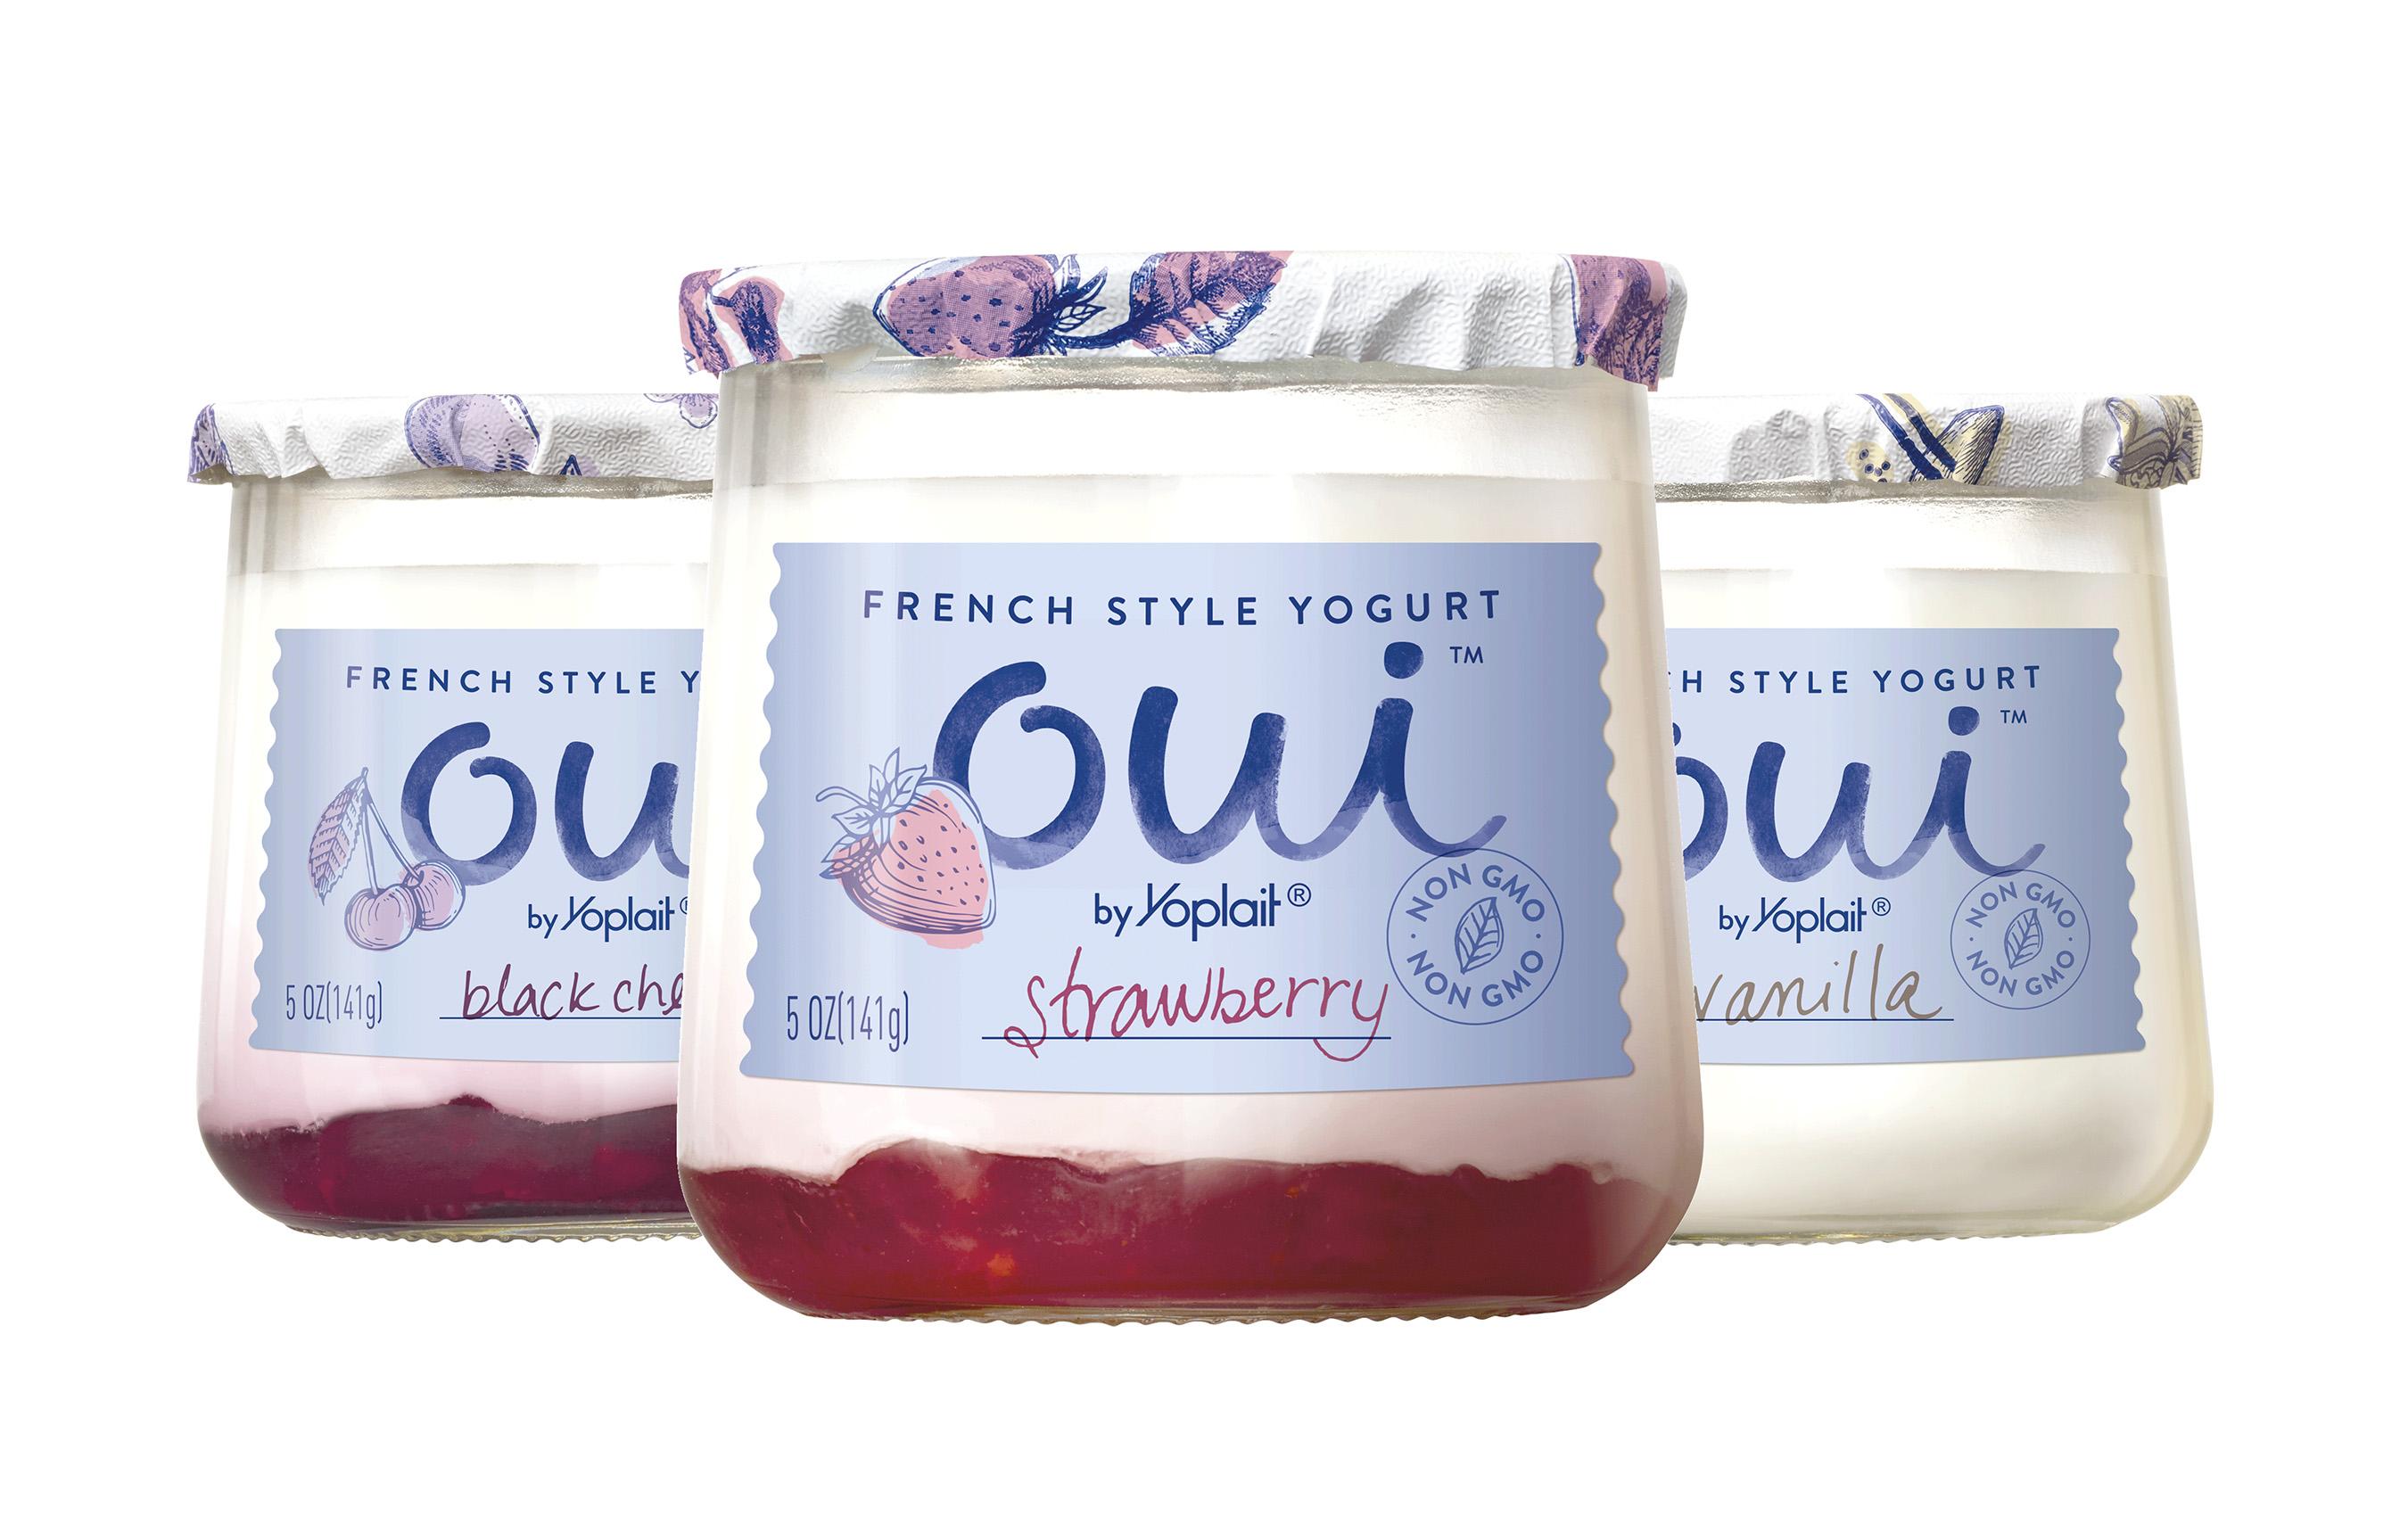 Yoplait Leverages Heritage Recipe To Bring French Style Yogurt To U.S.